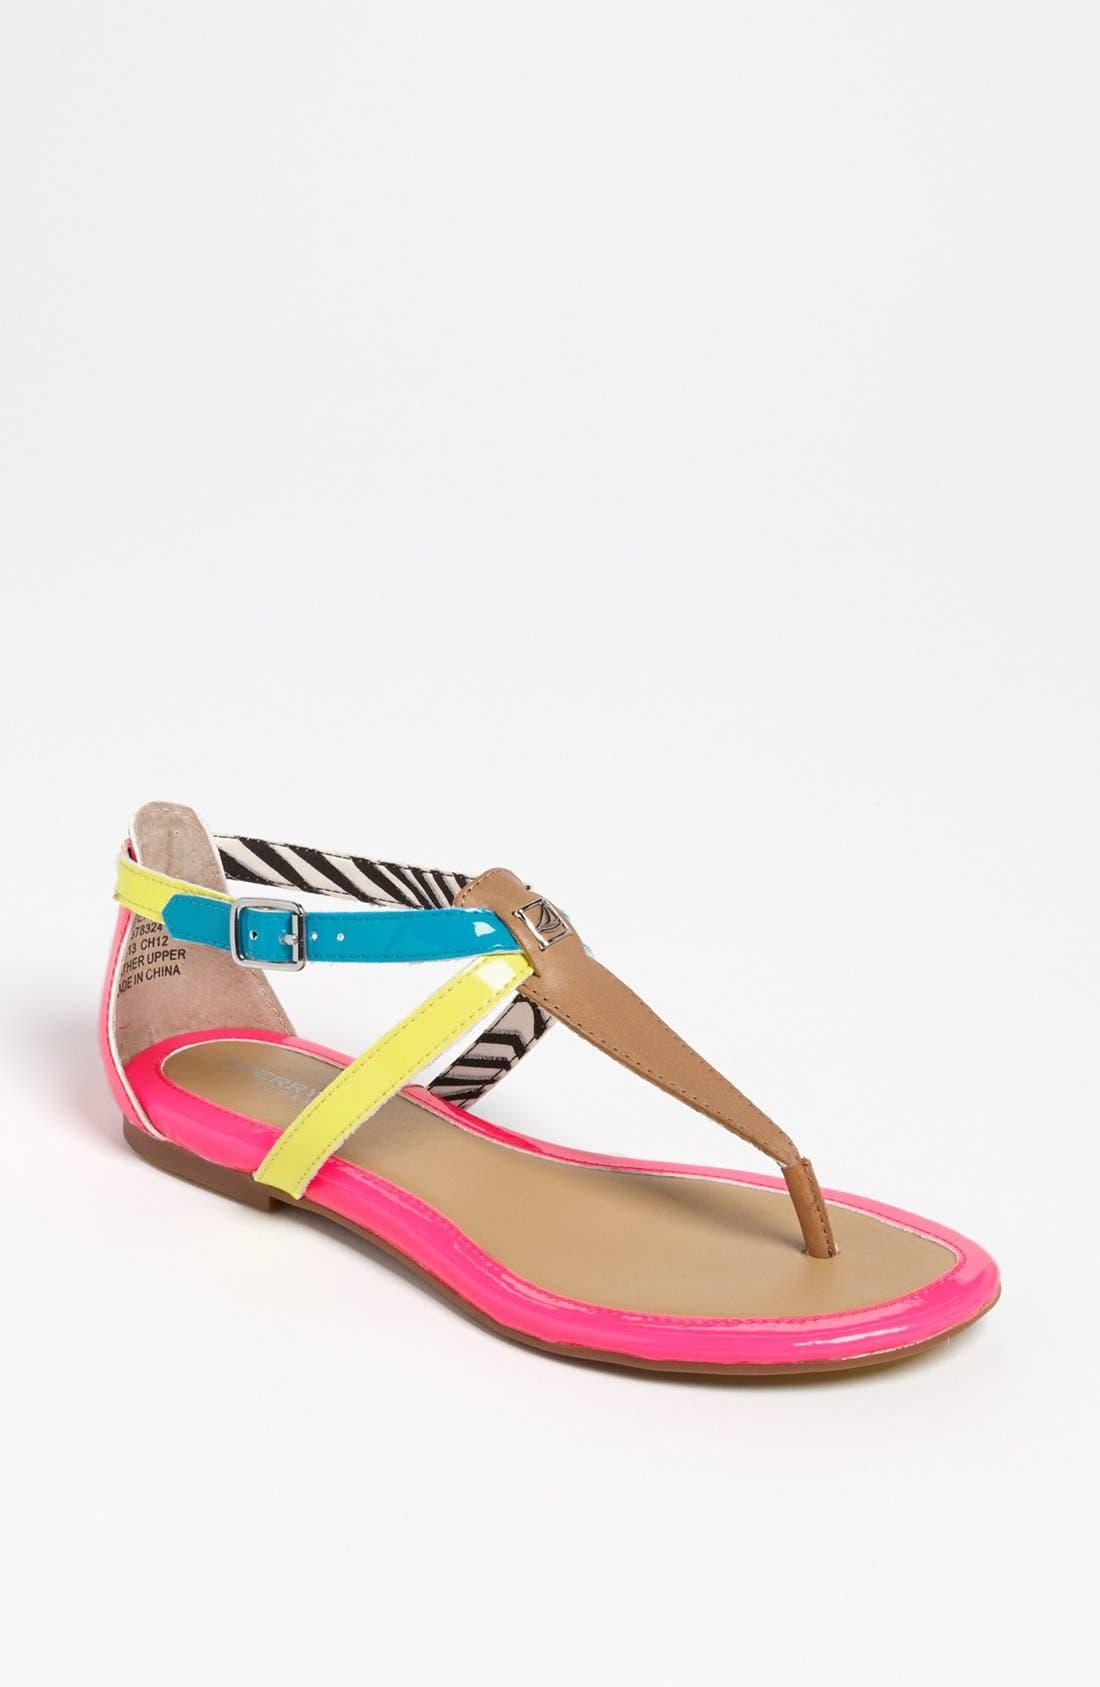 Main Image - Sperry Top-Sider® 'Summerlin' Sandal